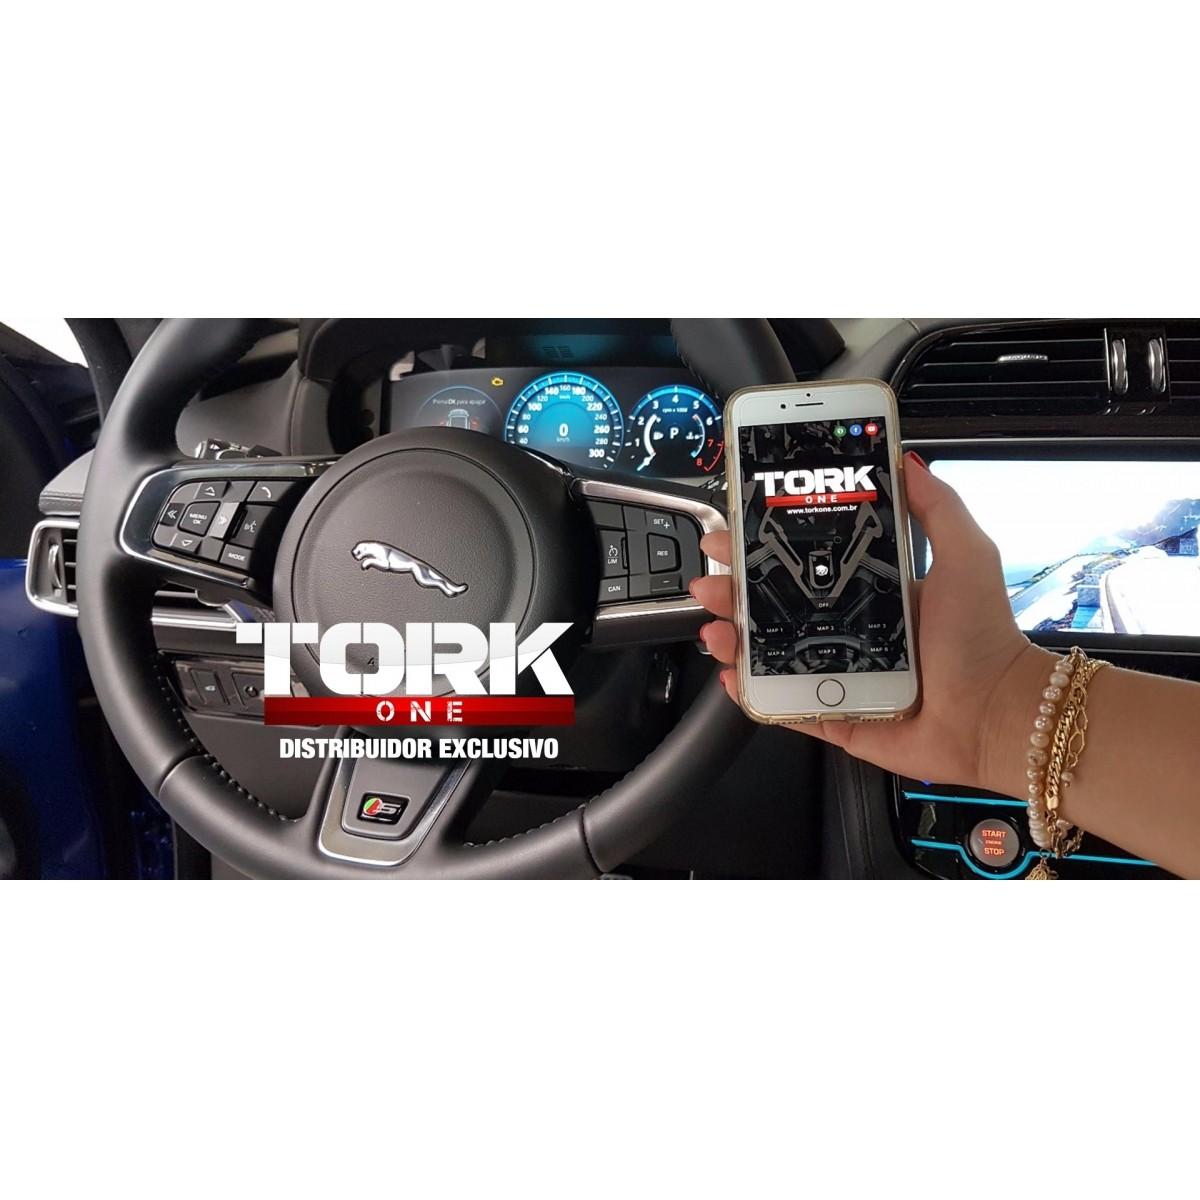 Gás Pedal - Hyundai - Tork One c/s Bluetooth